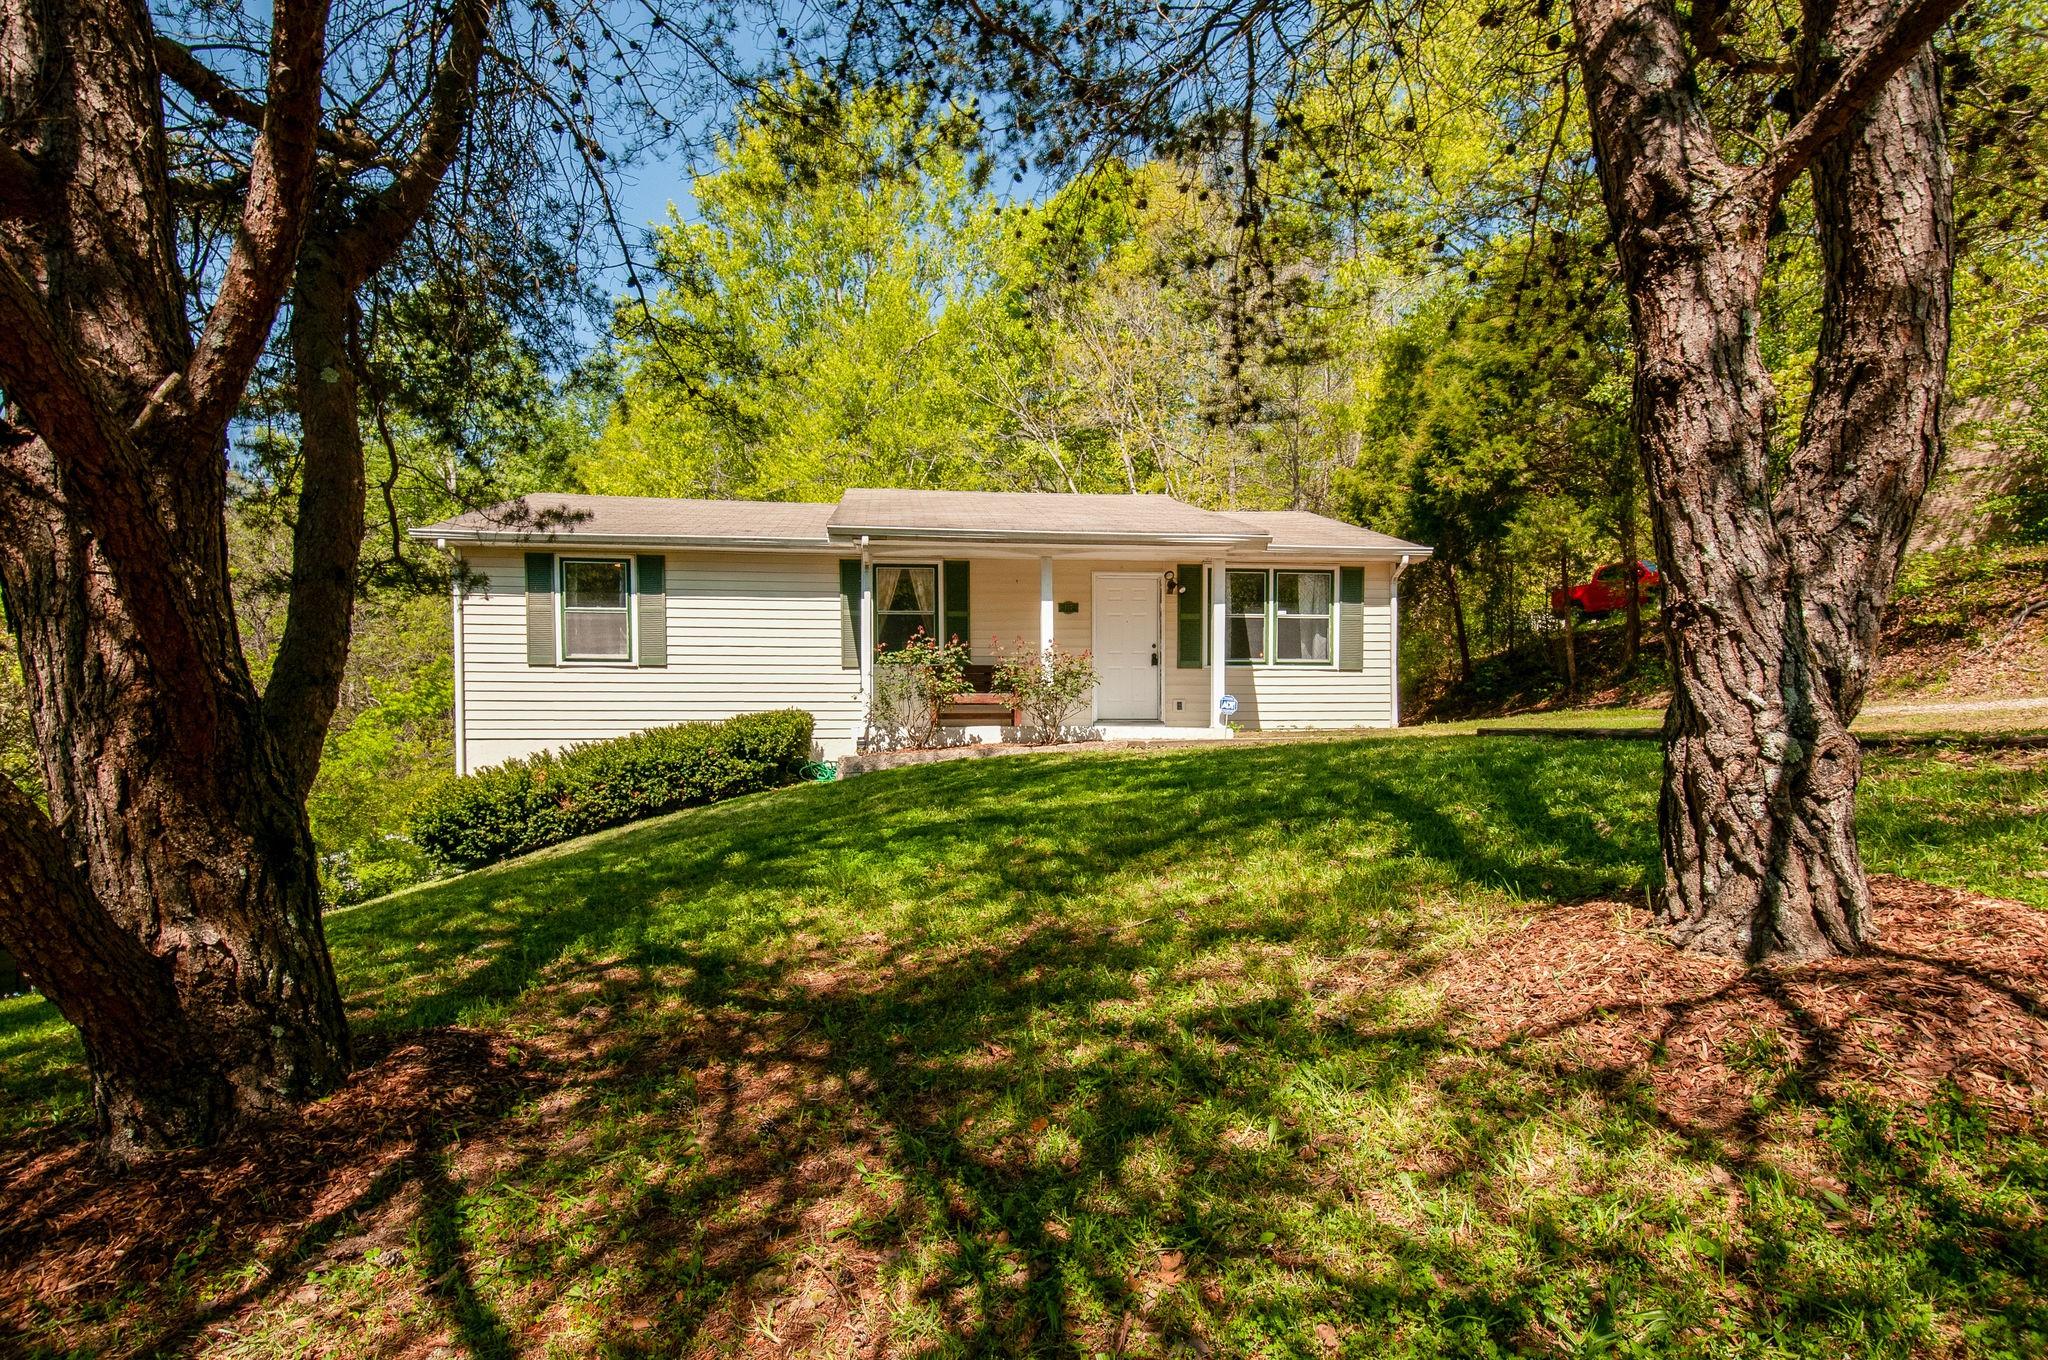 117 Annette Dr Property Photo - Ashland City, TN real estate listing